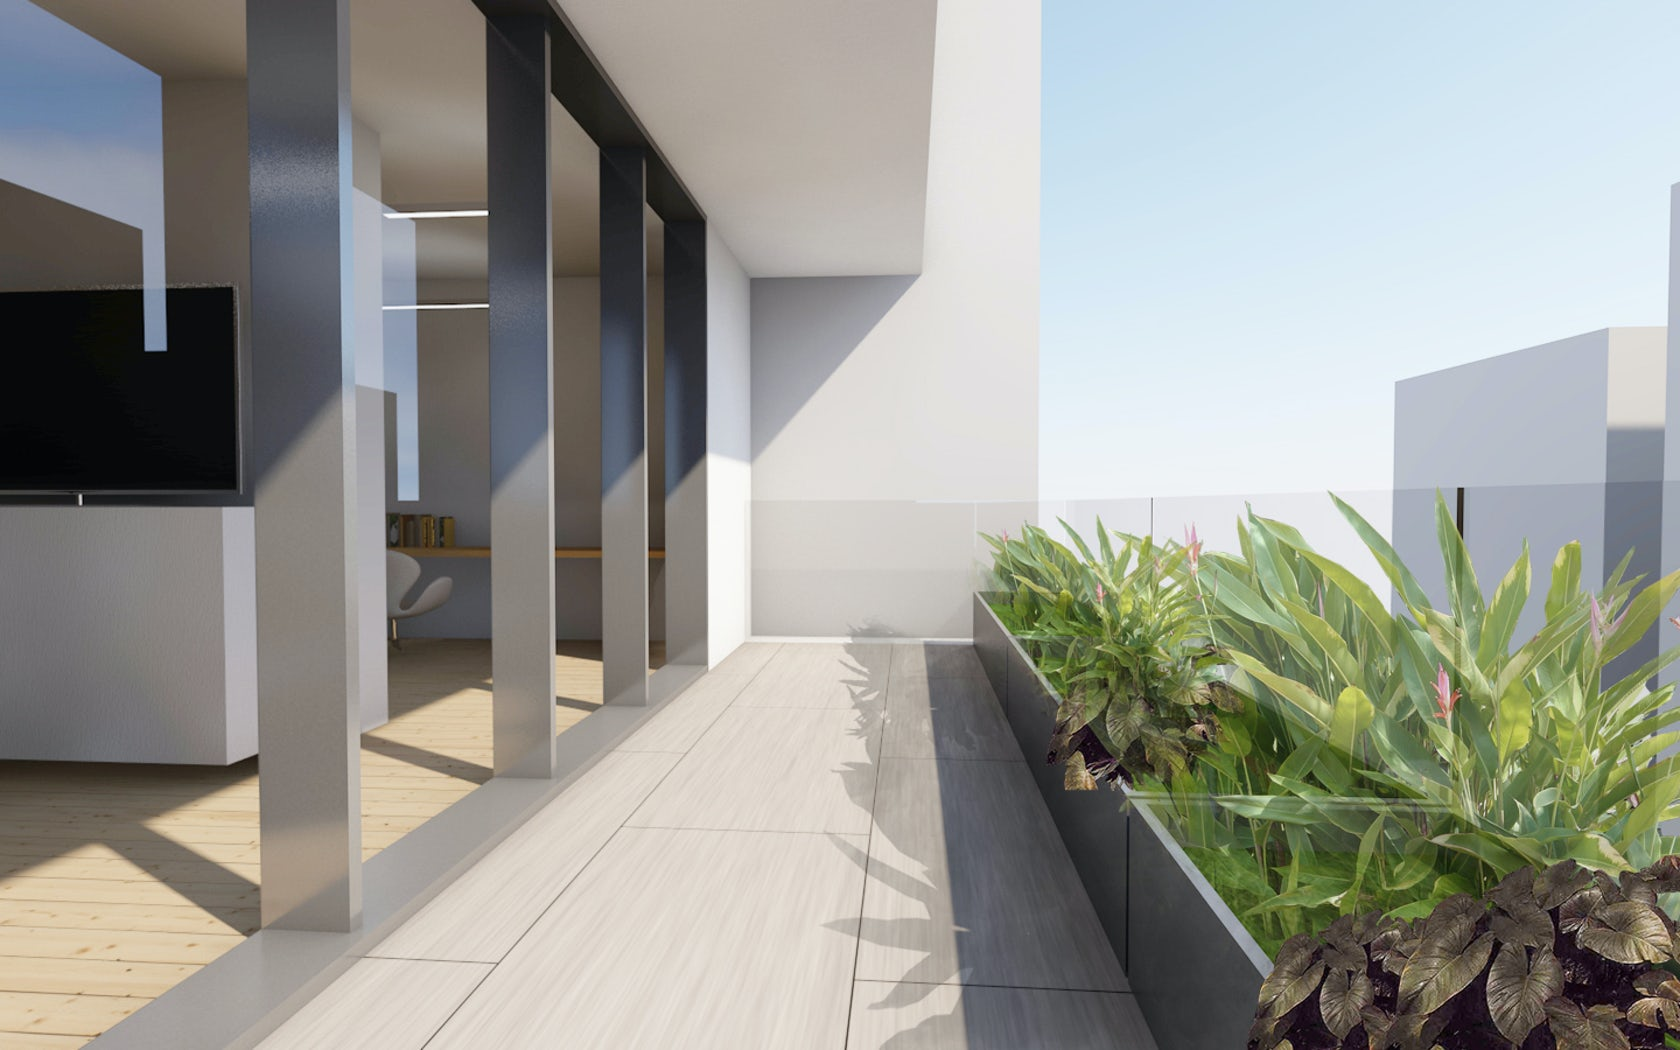 Frame house architizer for Mtr landscape architects